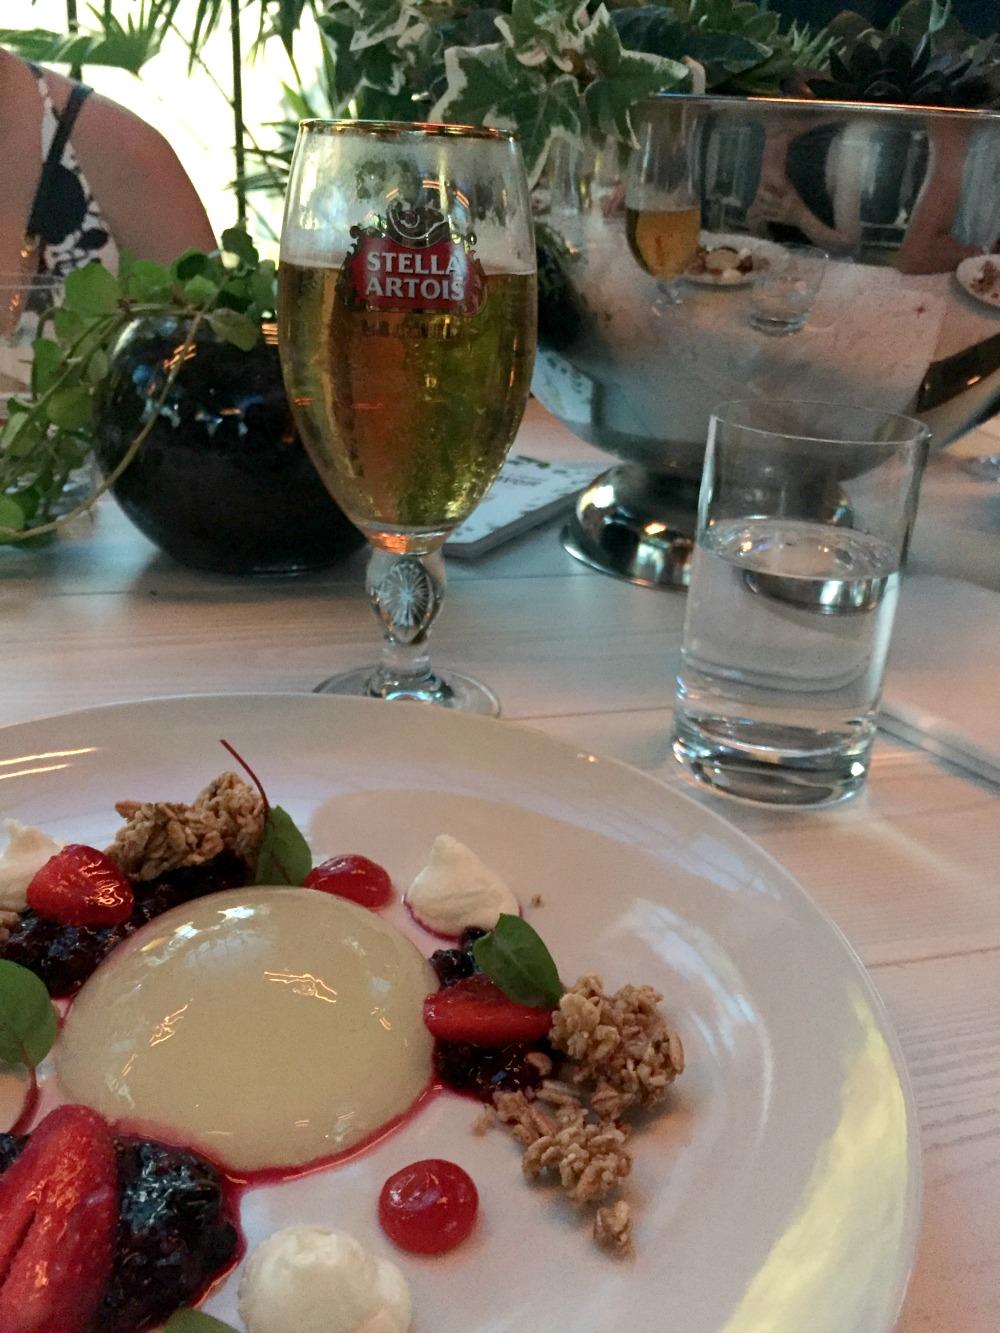 Stella Artois Le Savoir  dessert